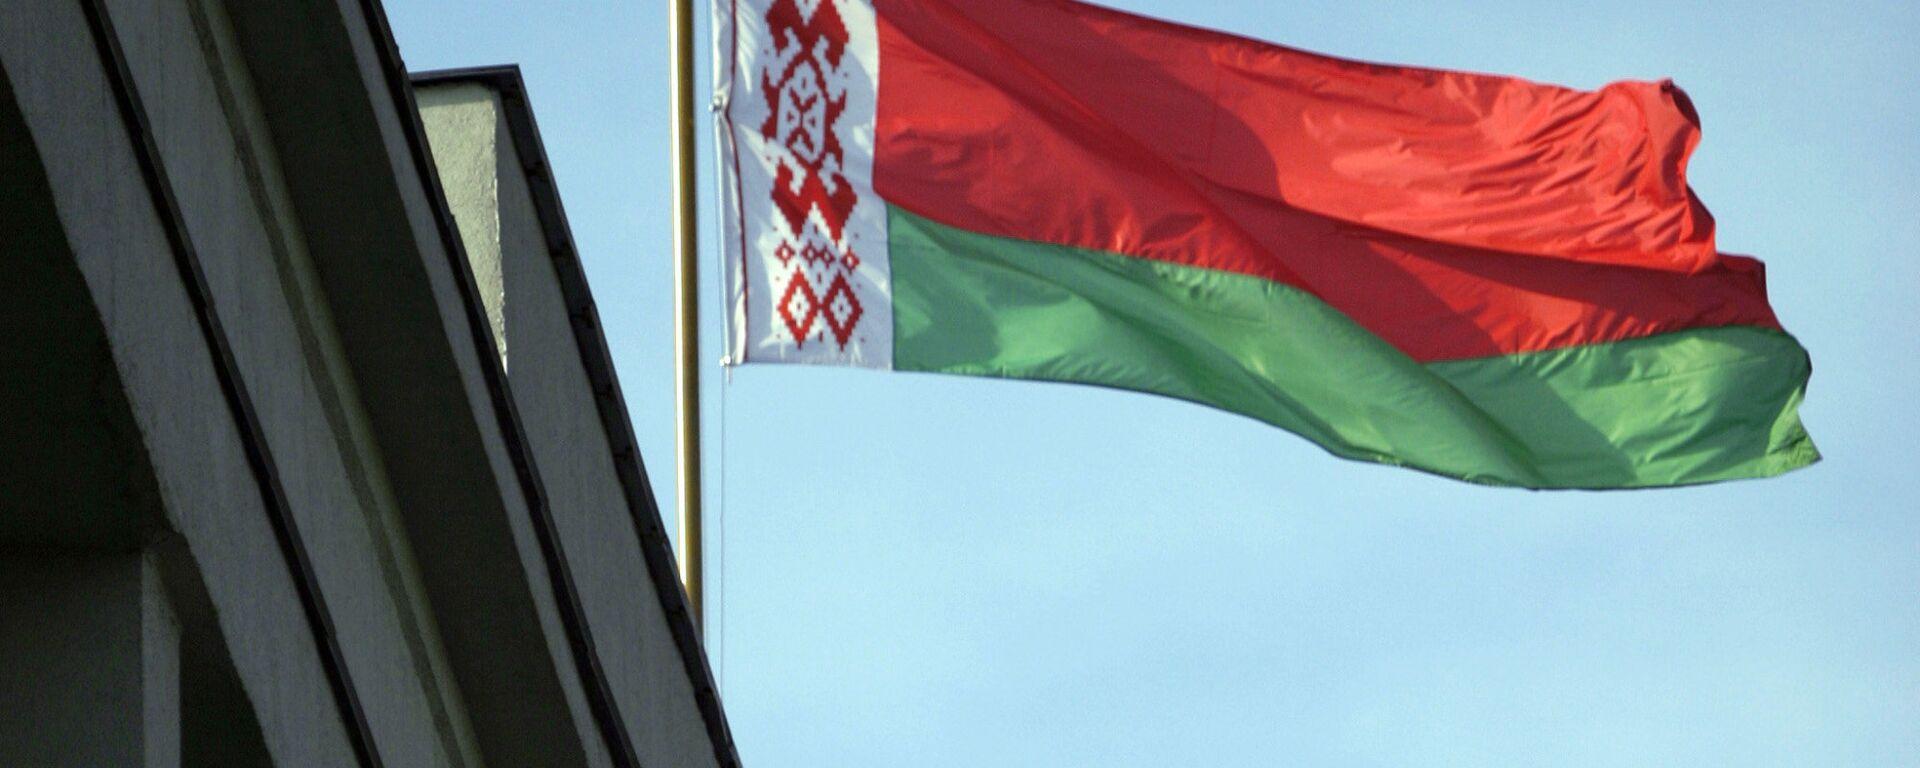 Bandera de Bielorrusia - Sputnik Mundo, 1920, 09.08.2021